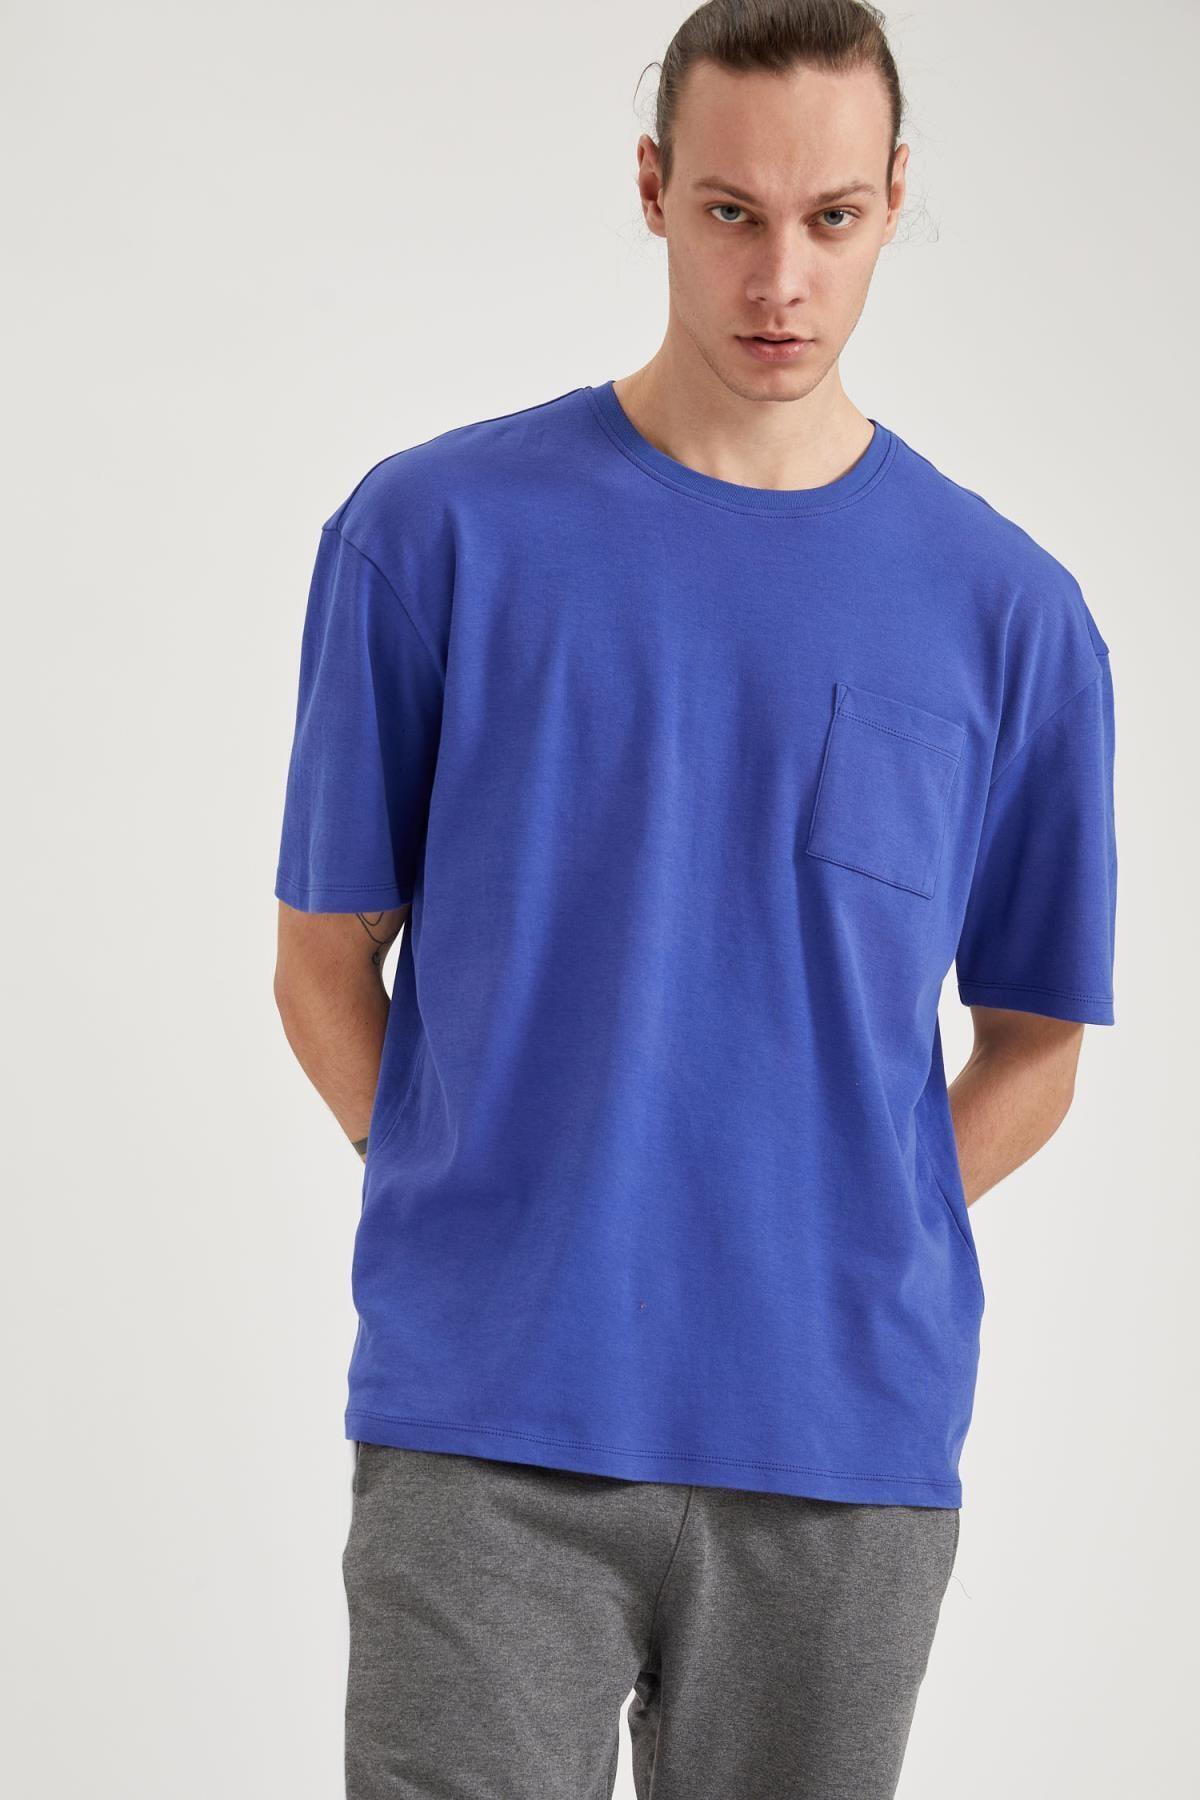 Defacto Oversize Fit Bisiklet Yaka Basic Tişört